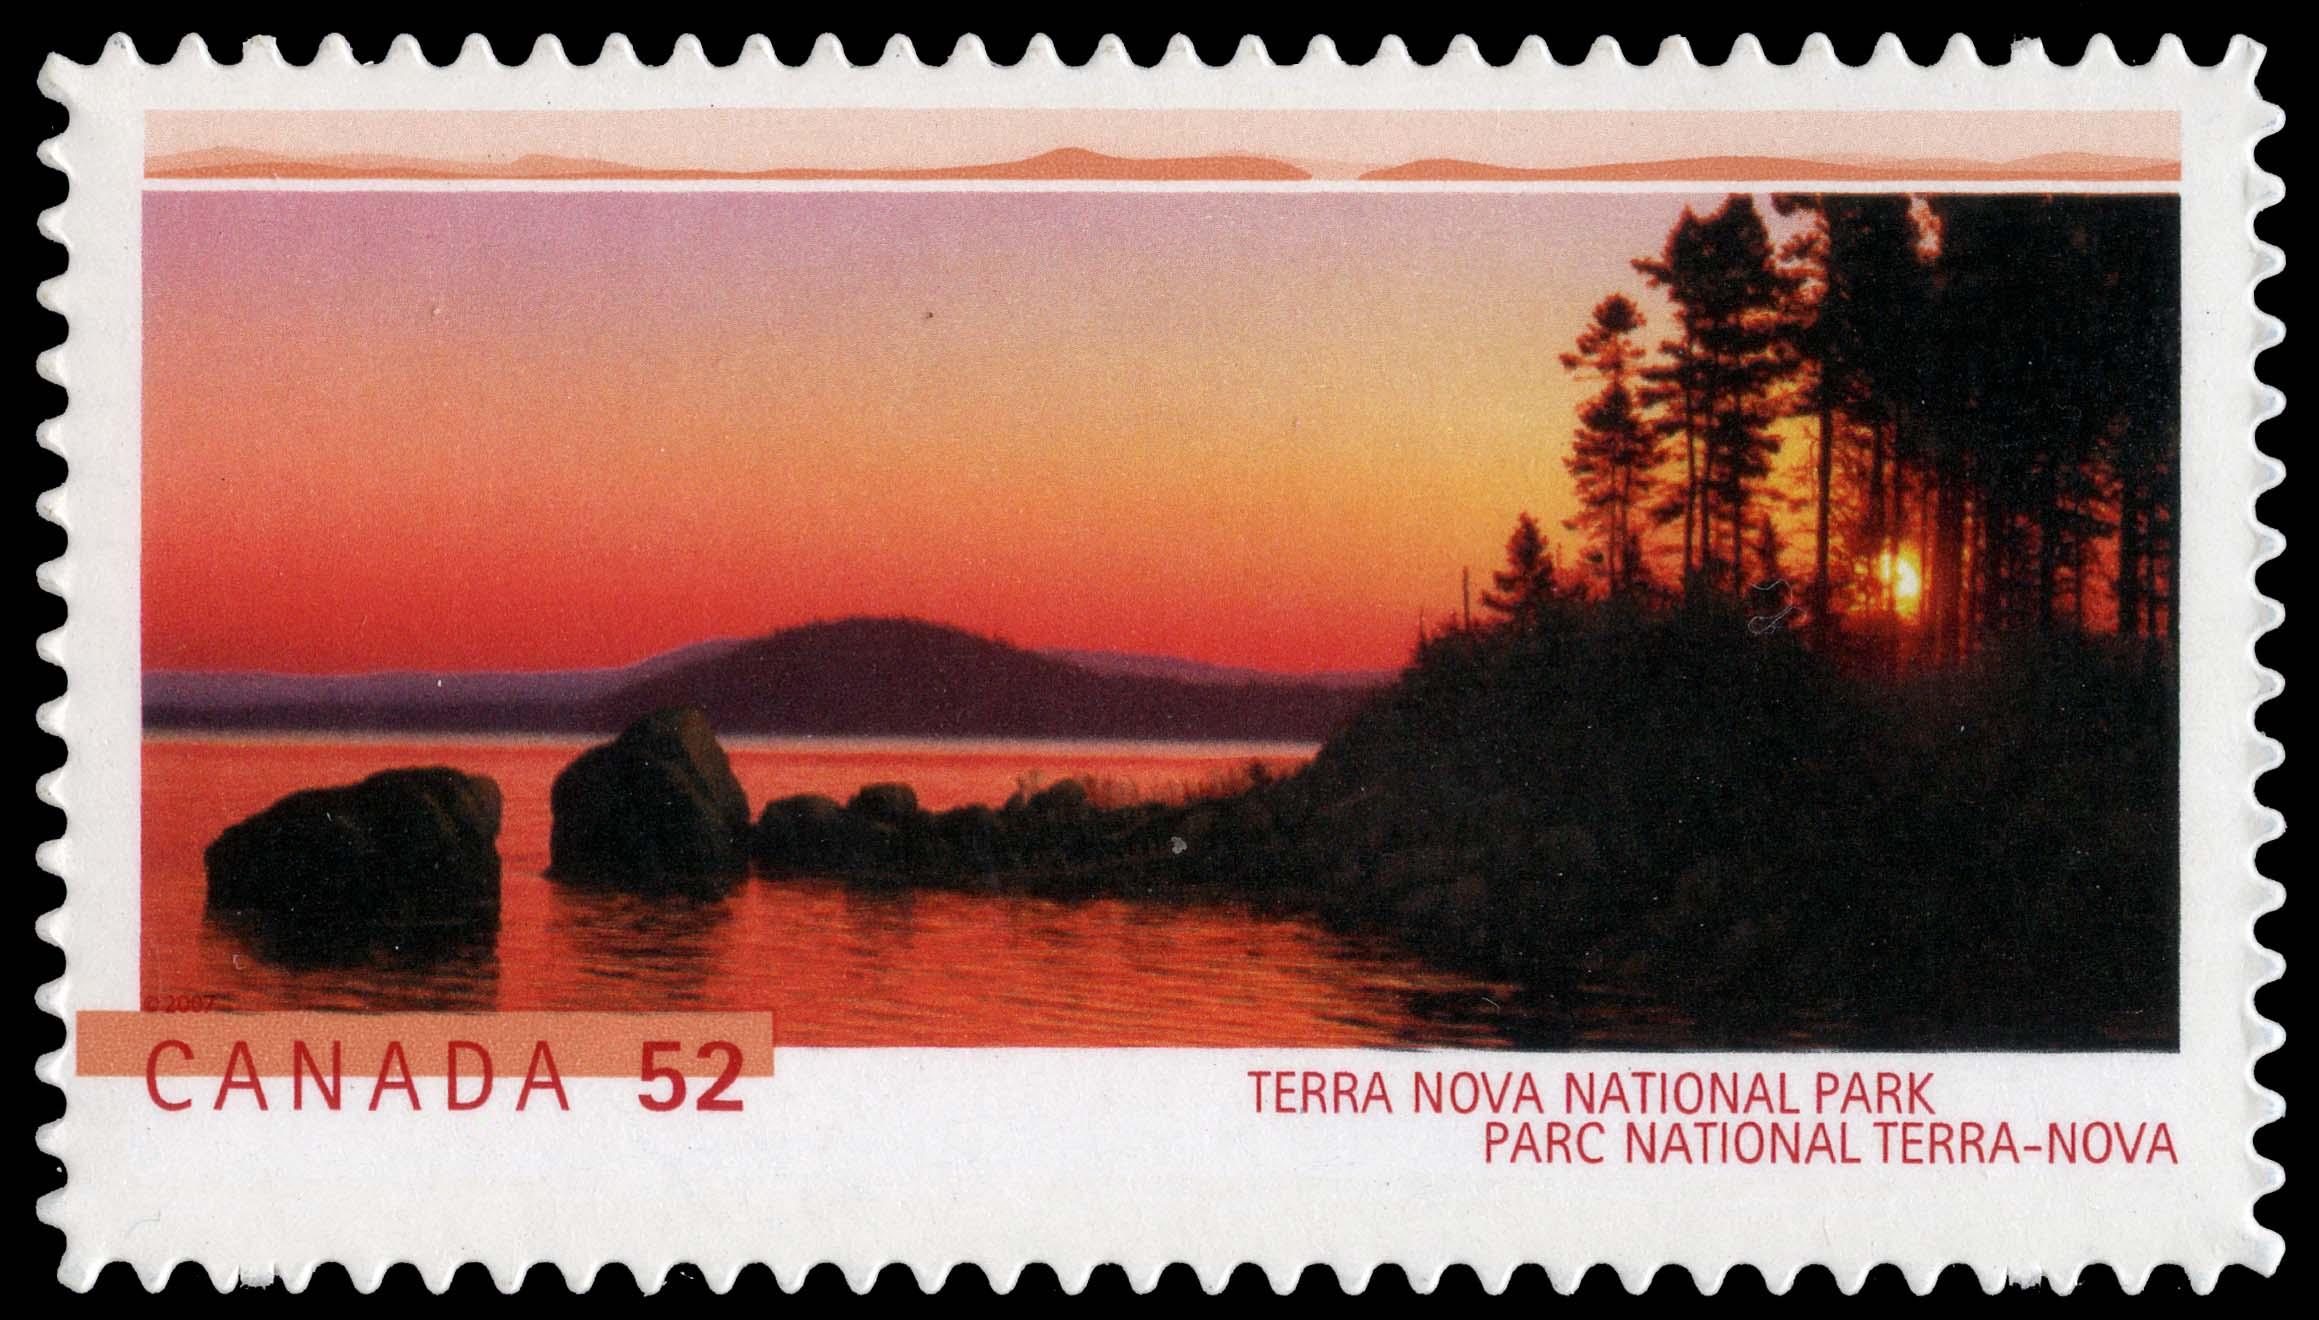 Terra Nova National Park Canada Postage Stamp